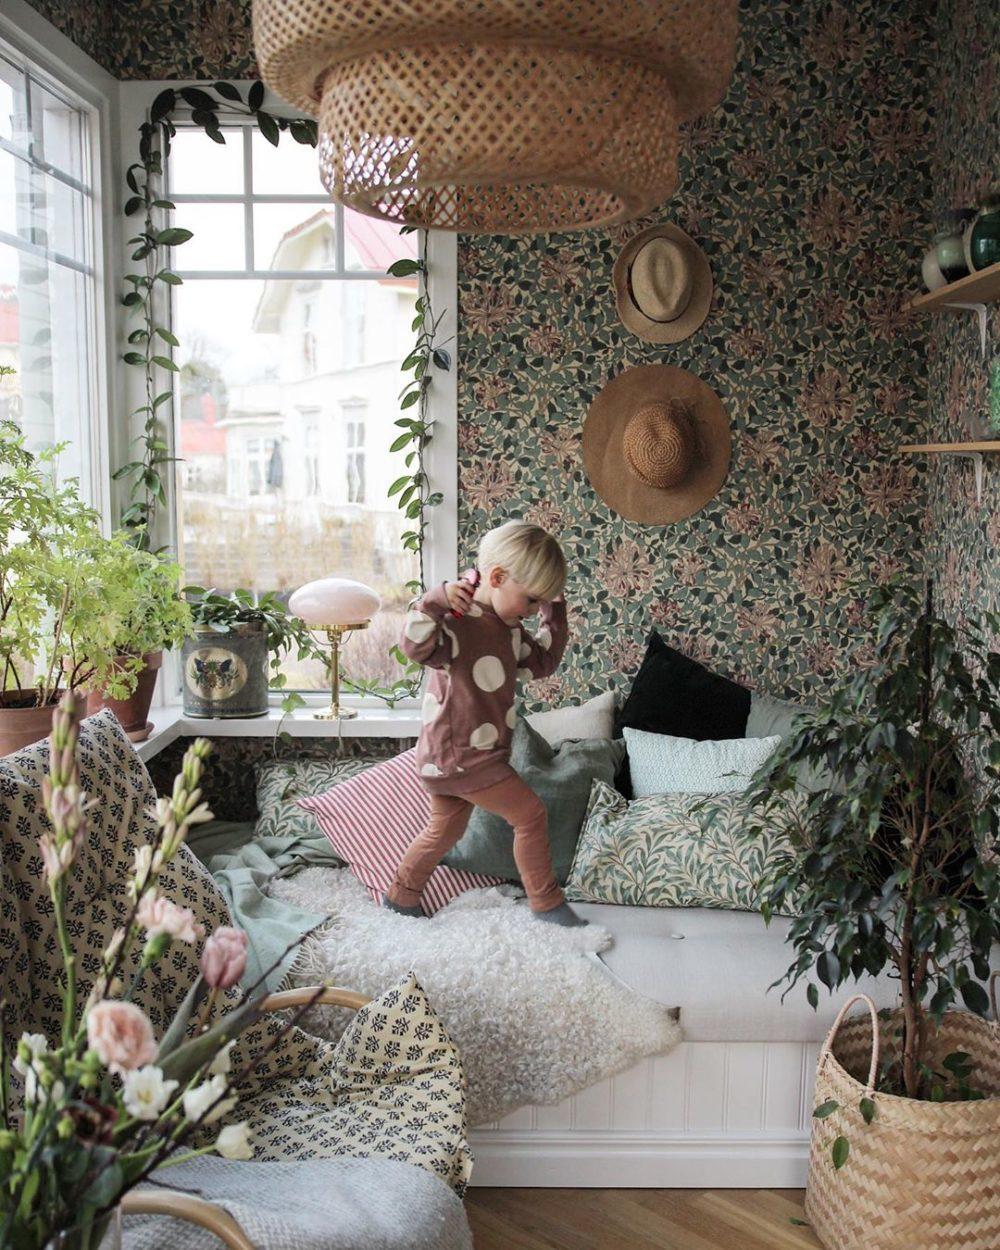 https://lovelylife.se/wp-content/uploads/hemmahosaugust_lovelylife_lindaochlouise